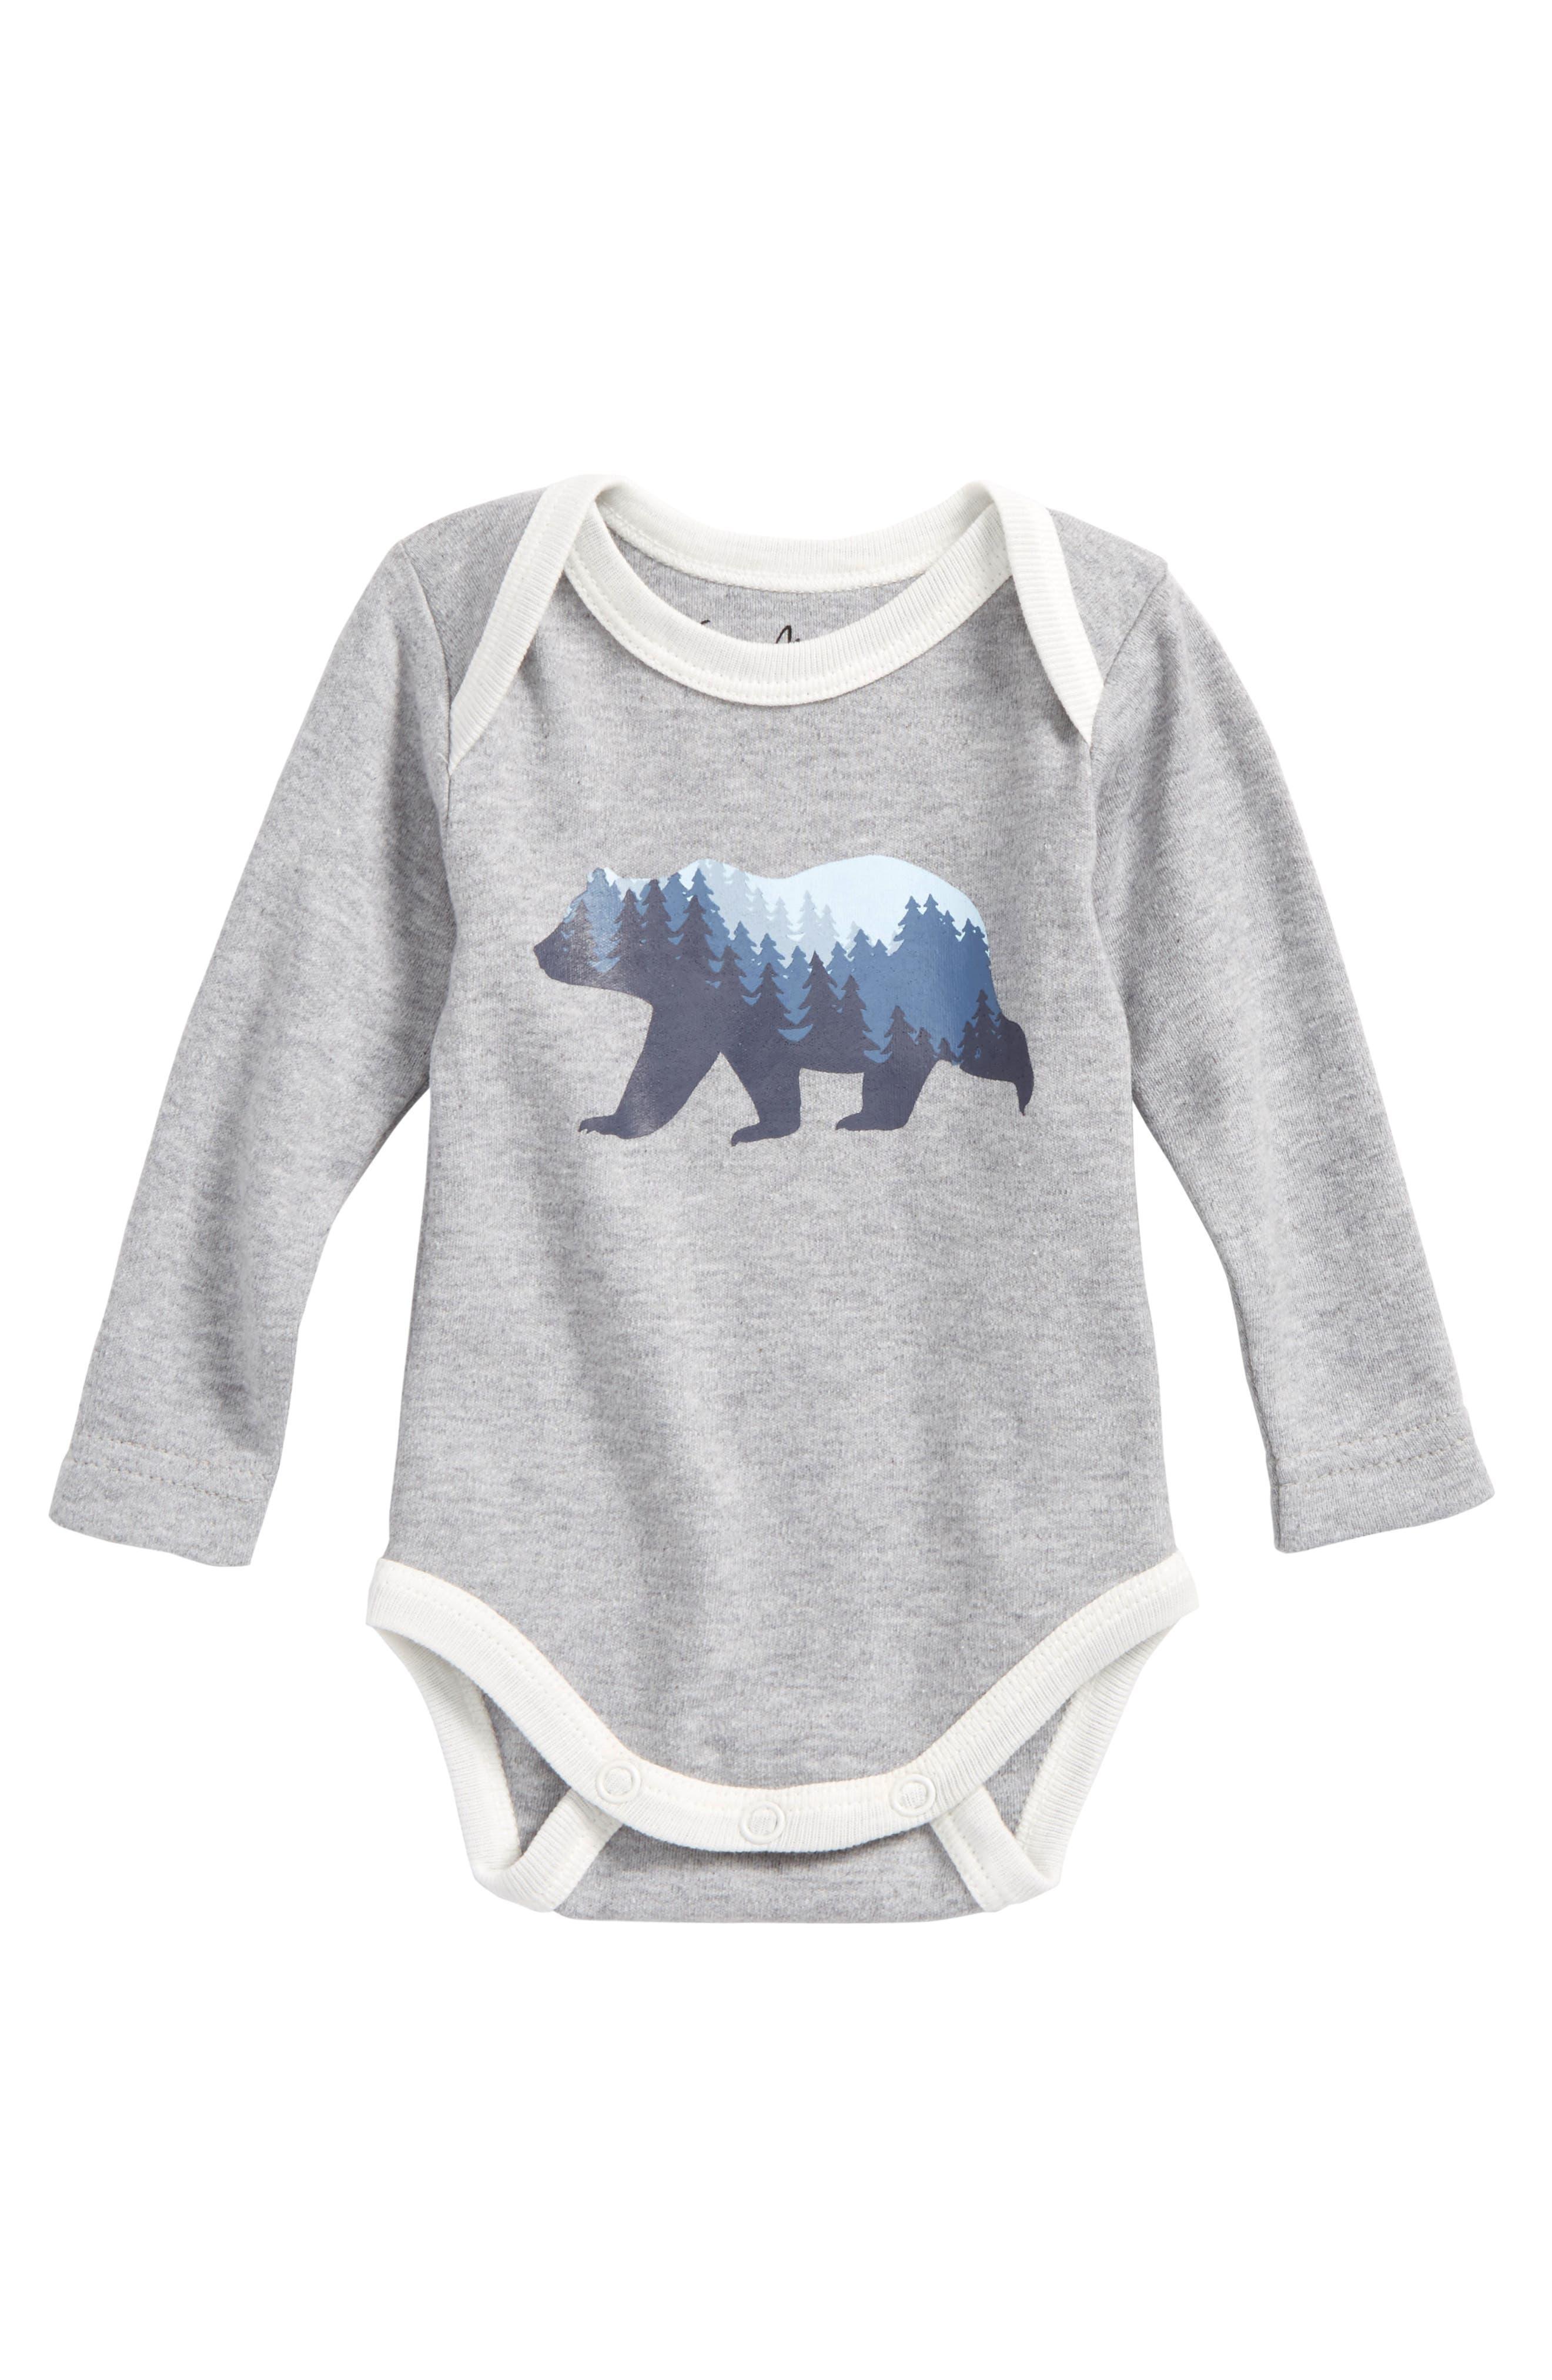 Main Image - City Mouse Bear Graphic Organic Cotton Bodysuit (Baby)